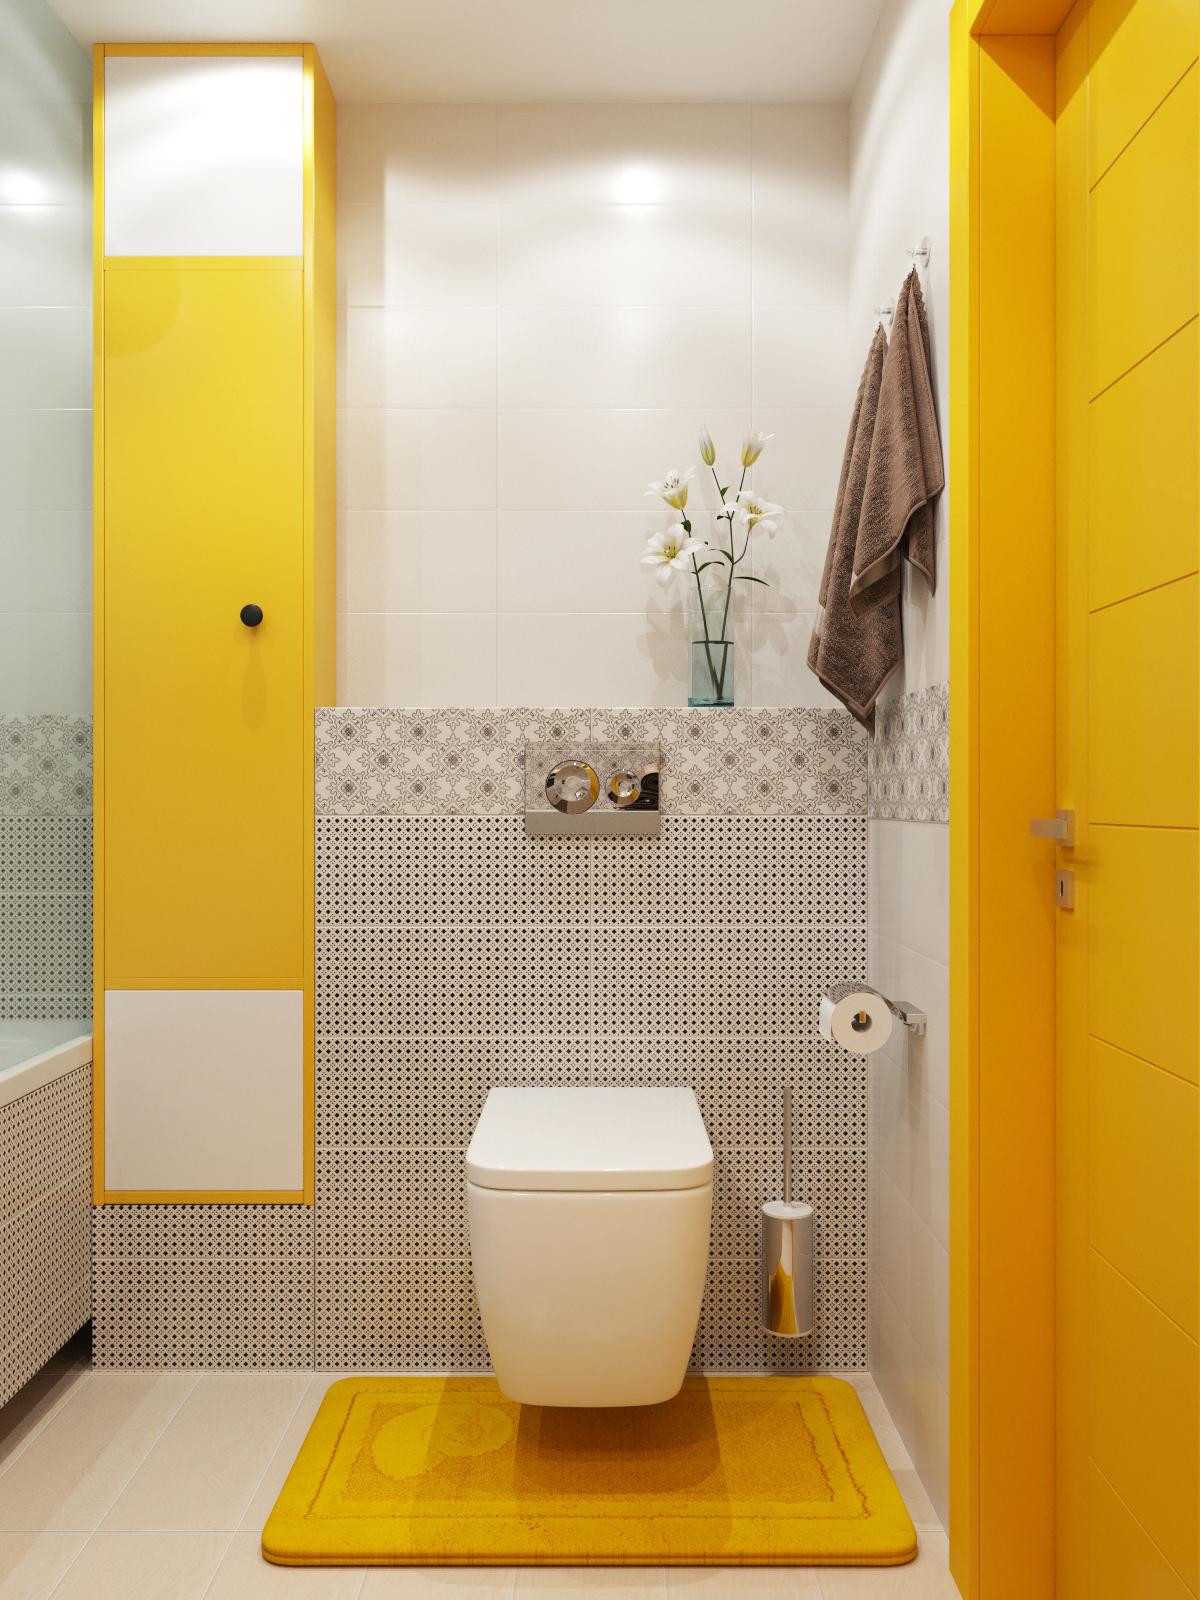 Дизайн интерьер ванной комнаты санузла